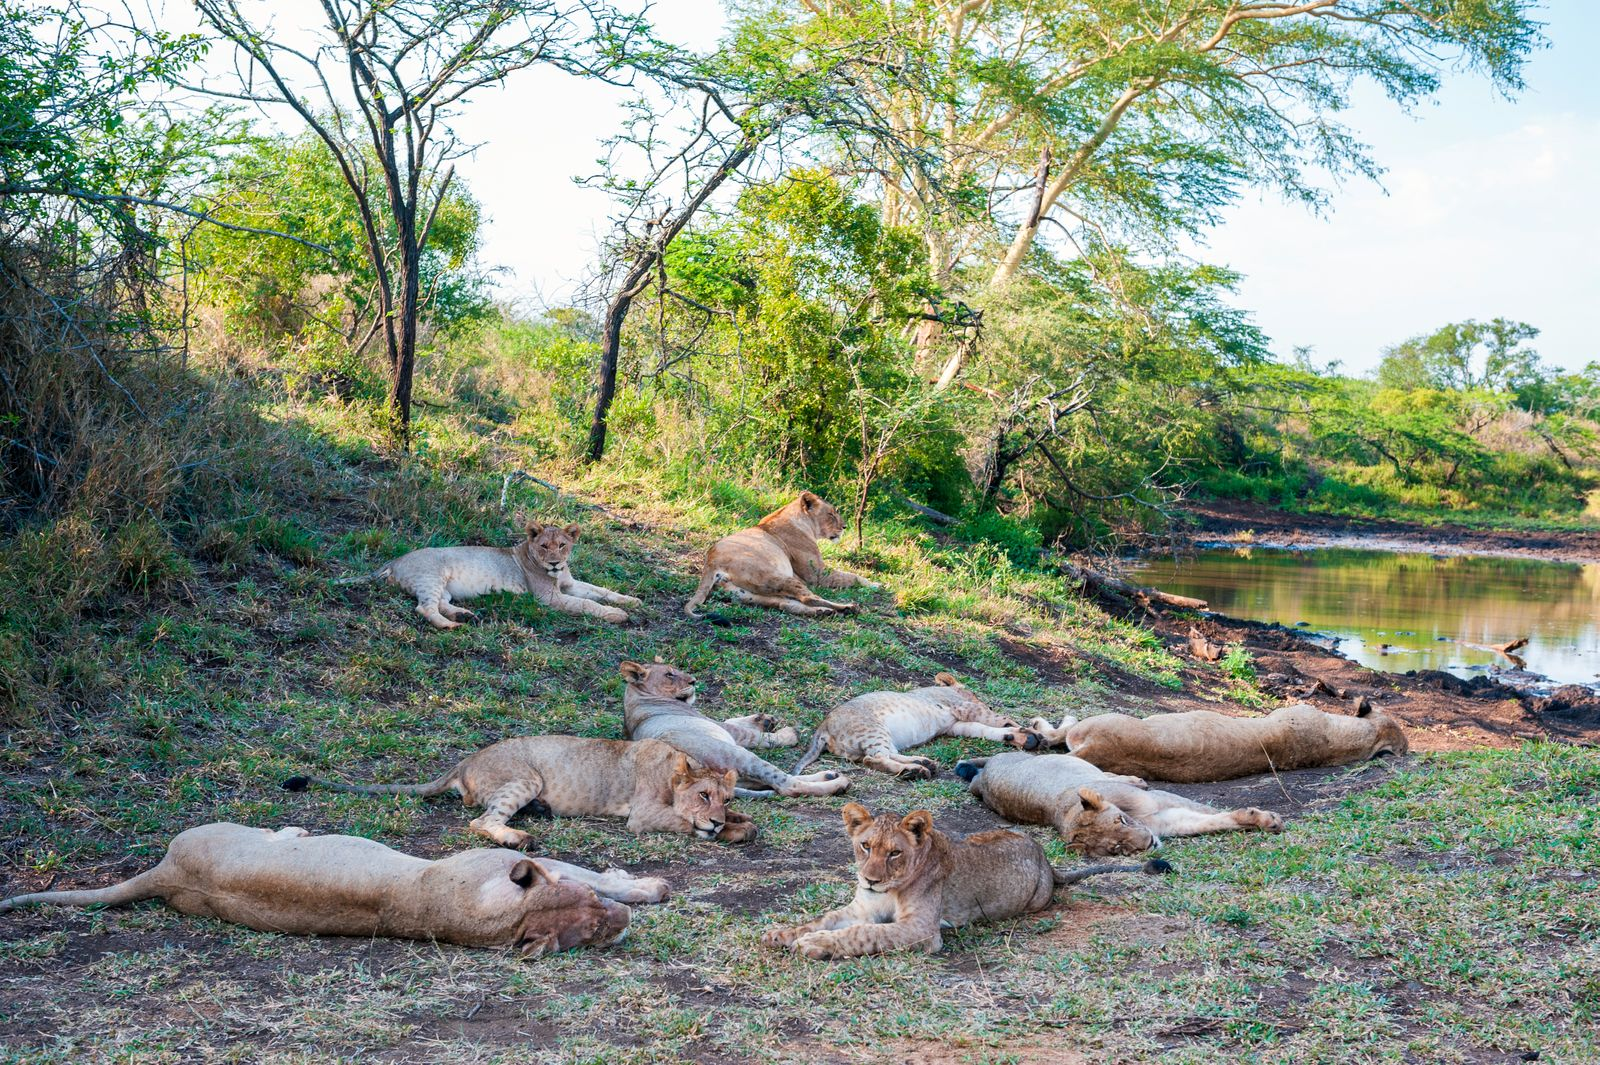 A pride of lions at Thanda Safari Lodge, a 14 000-hectare